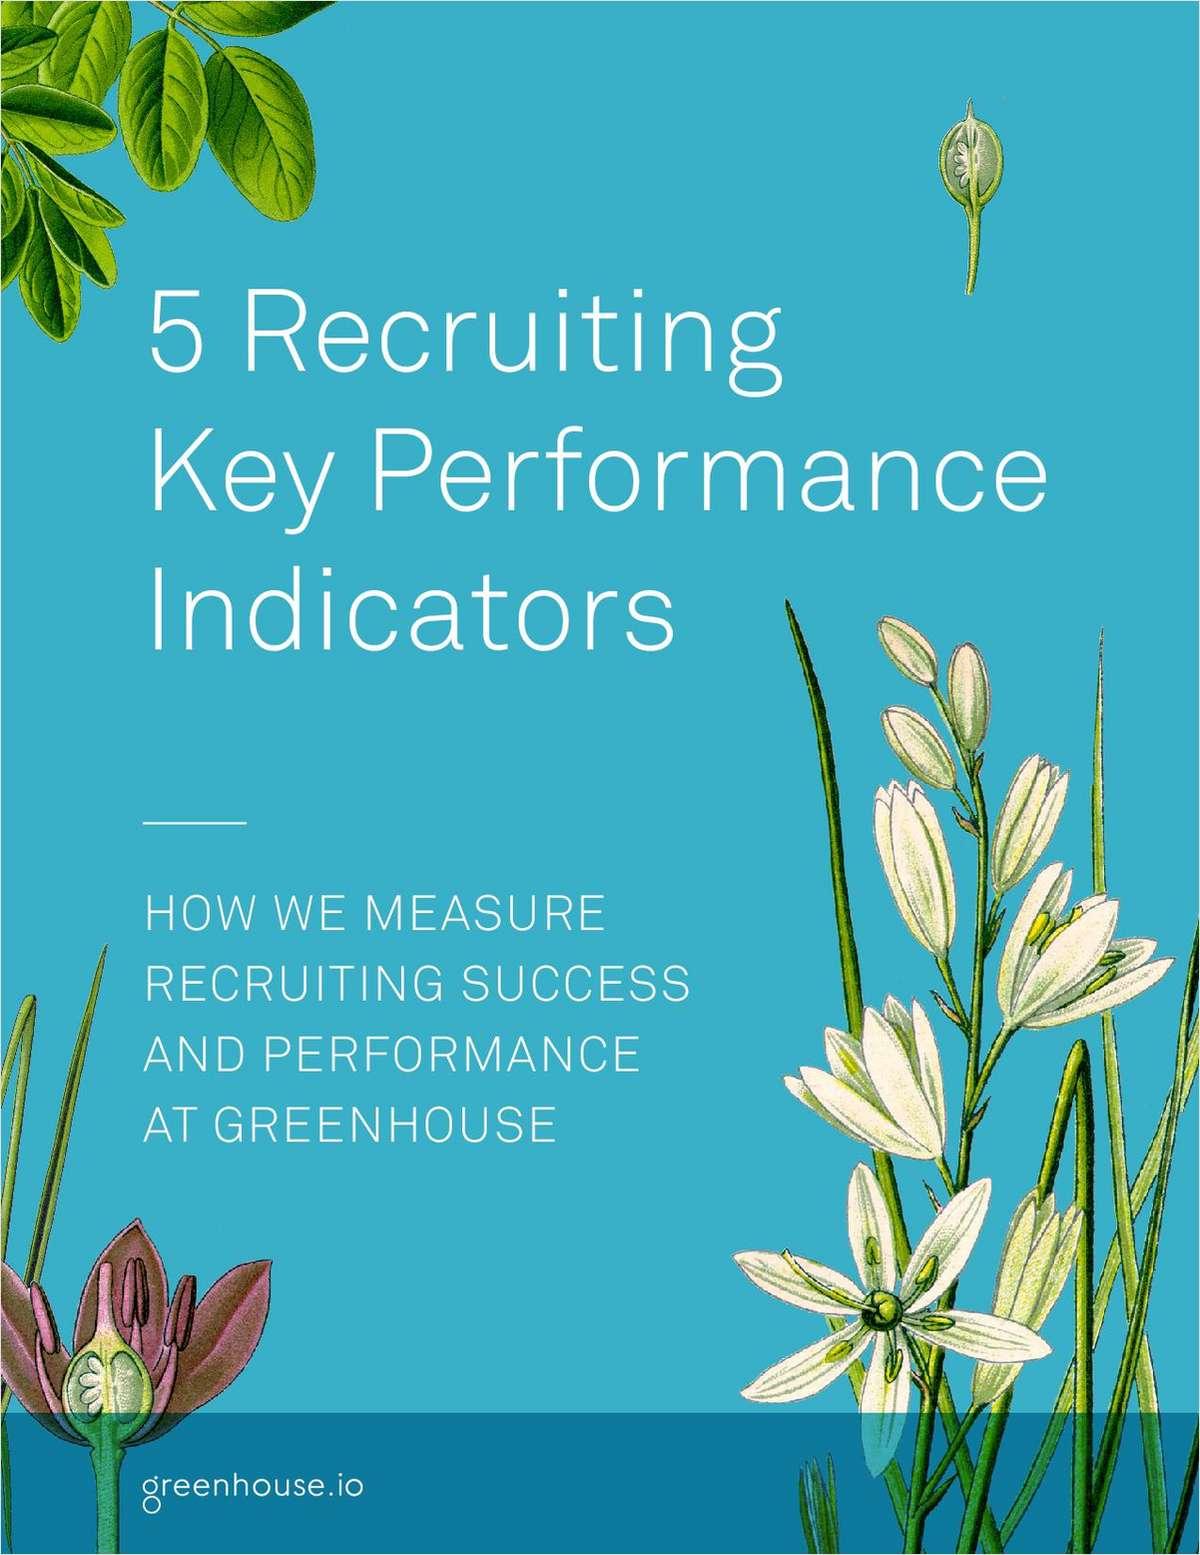 5 Recruiting Key Performance Indicators